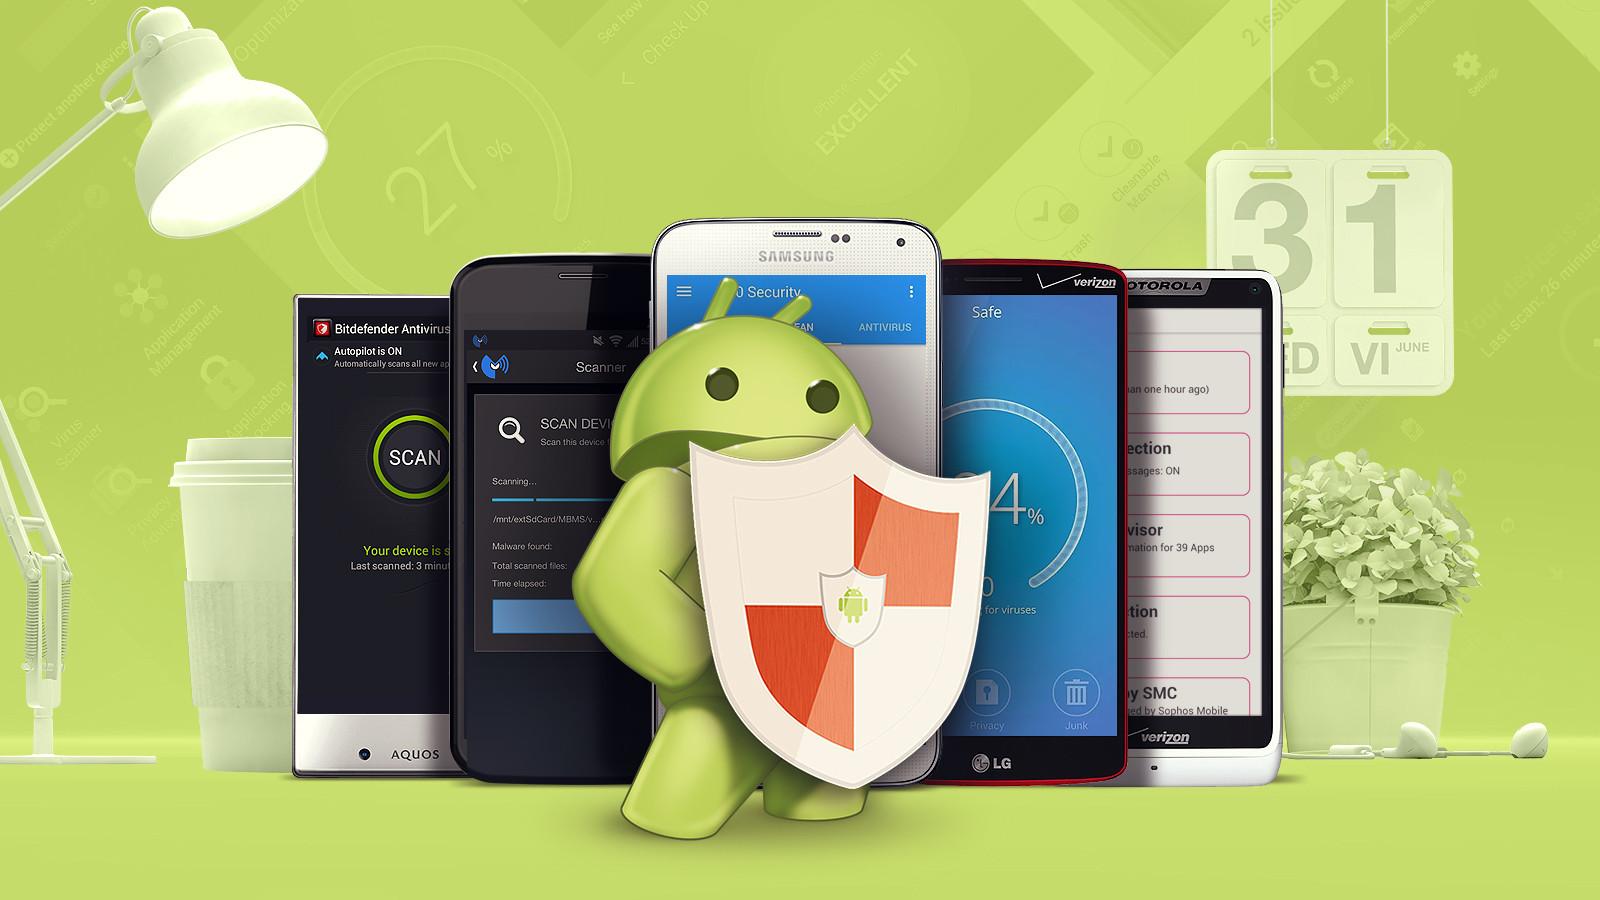 Los 5 mejores antivirus para Android 2017